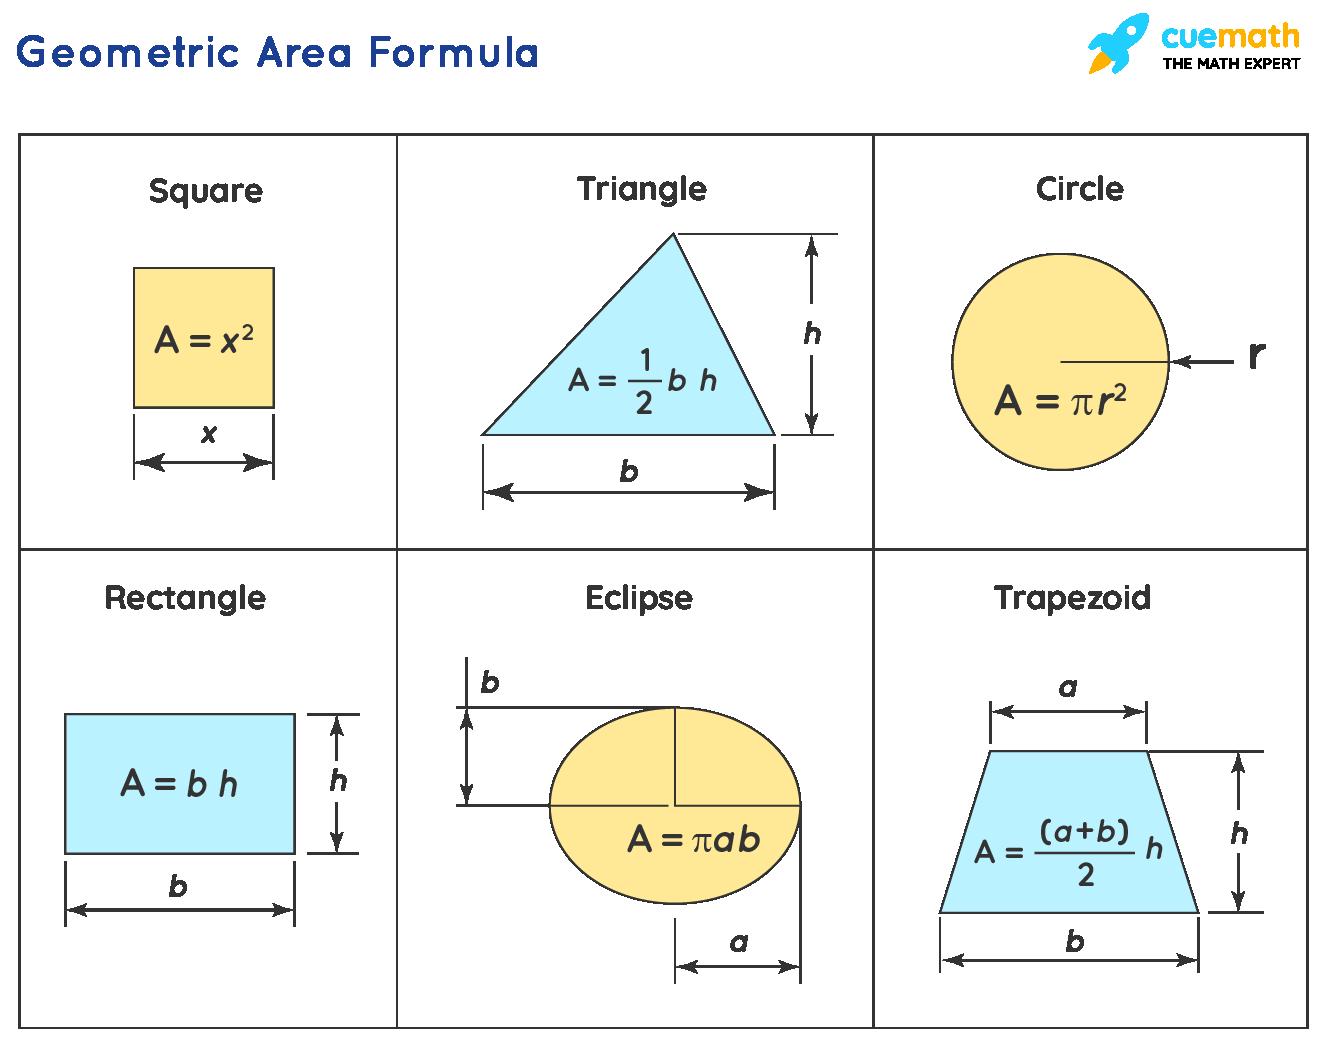 Geometric Area Formula